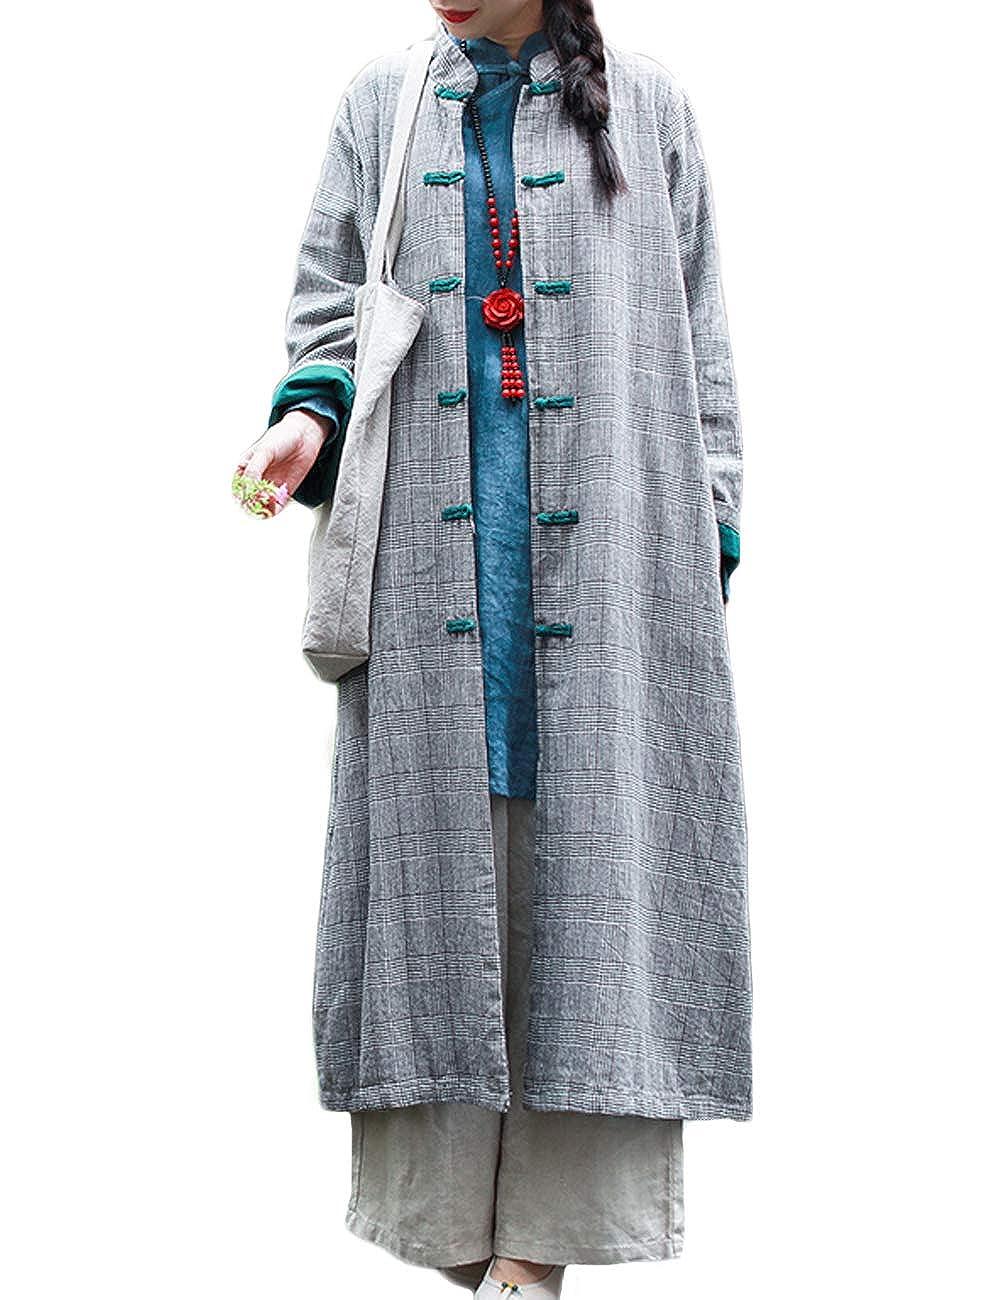 LZJN Women's Autumn Trench Coat Jacket Cotton Linen Plaid Windbreaker